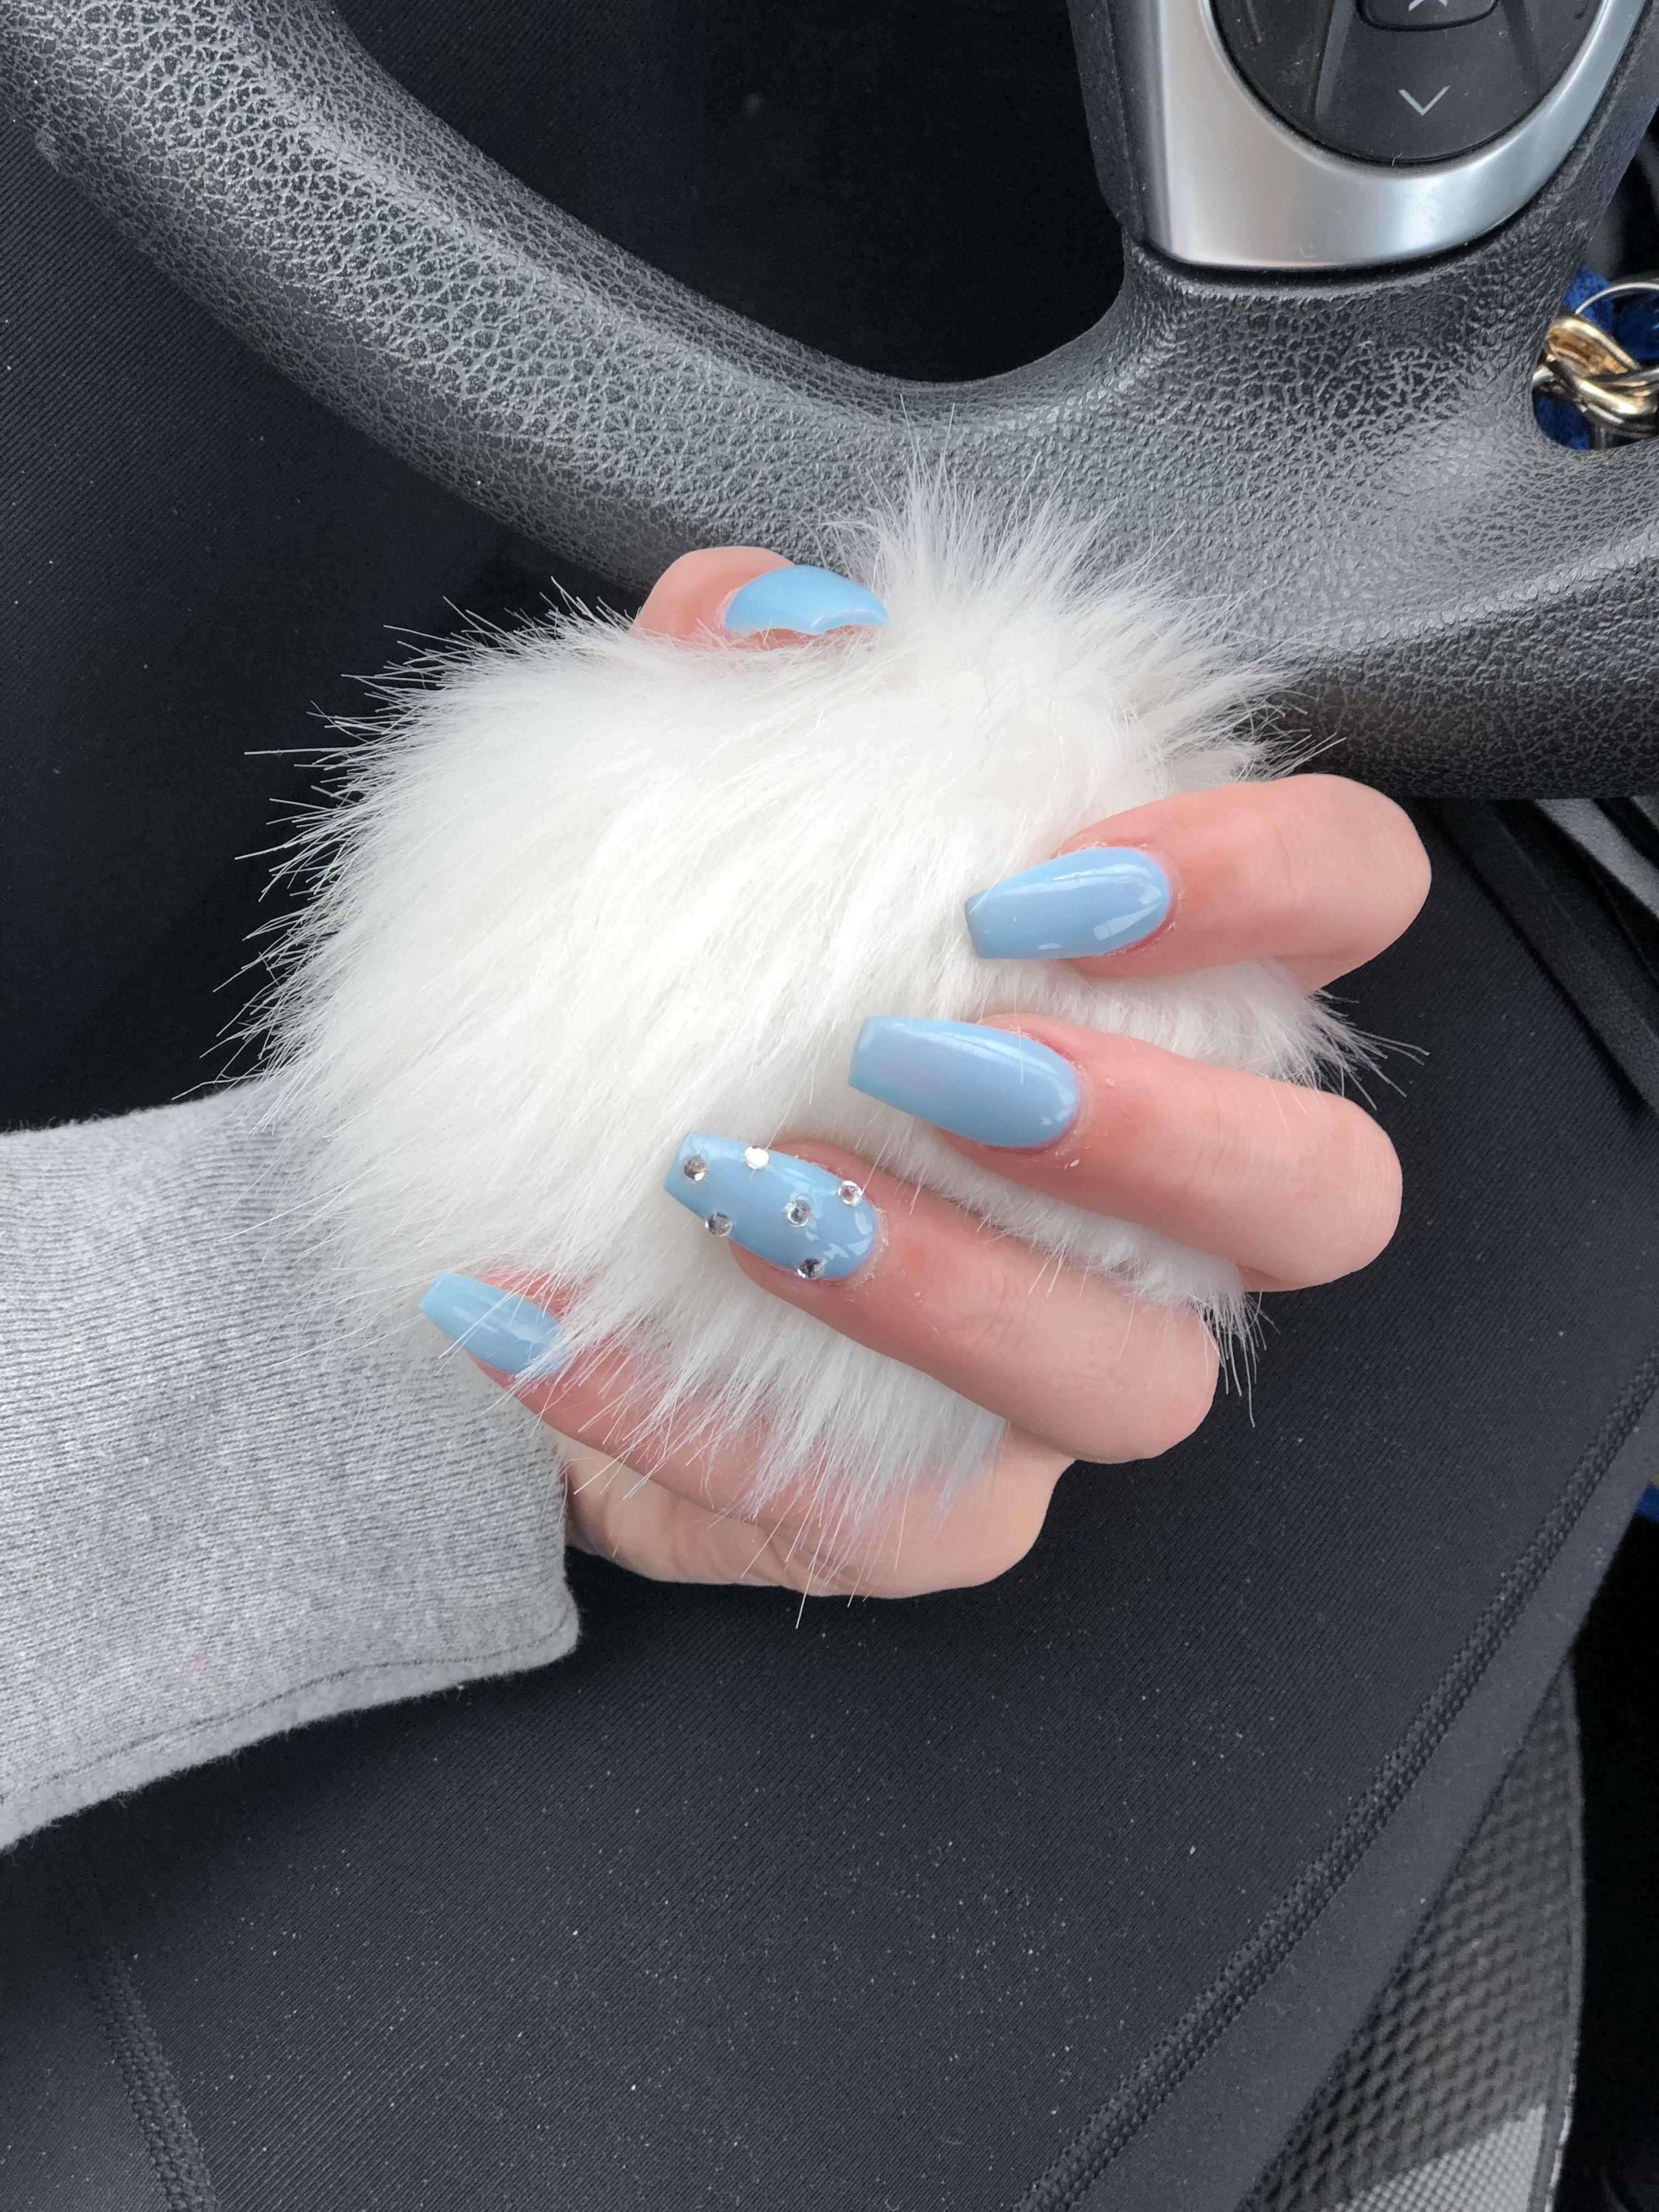 Tiffany Nails Blue With Rhinestone Sparkle Pattern Coffin Shaped Acrylics In 2020 Tiffany Nails Nails Birthday Nails